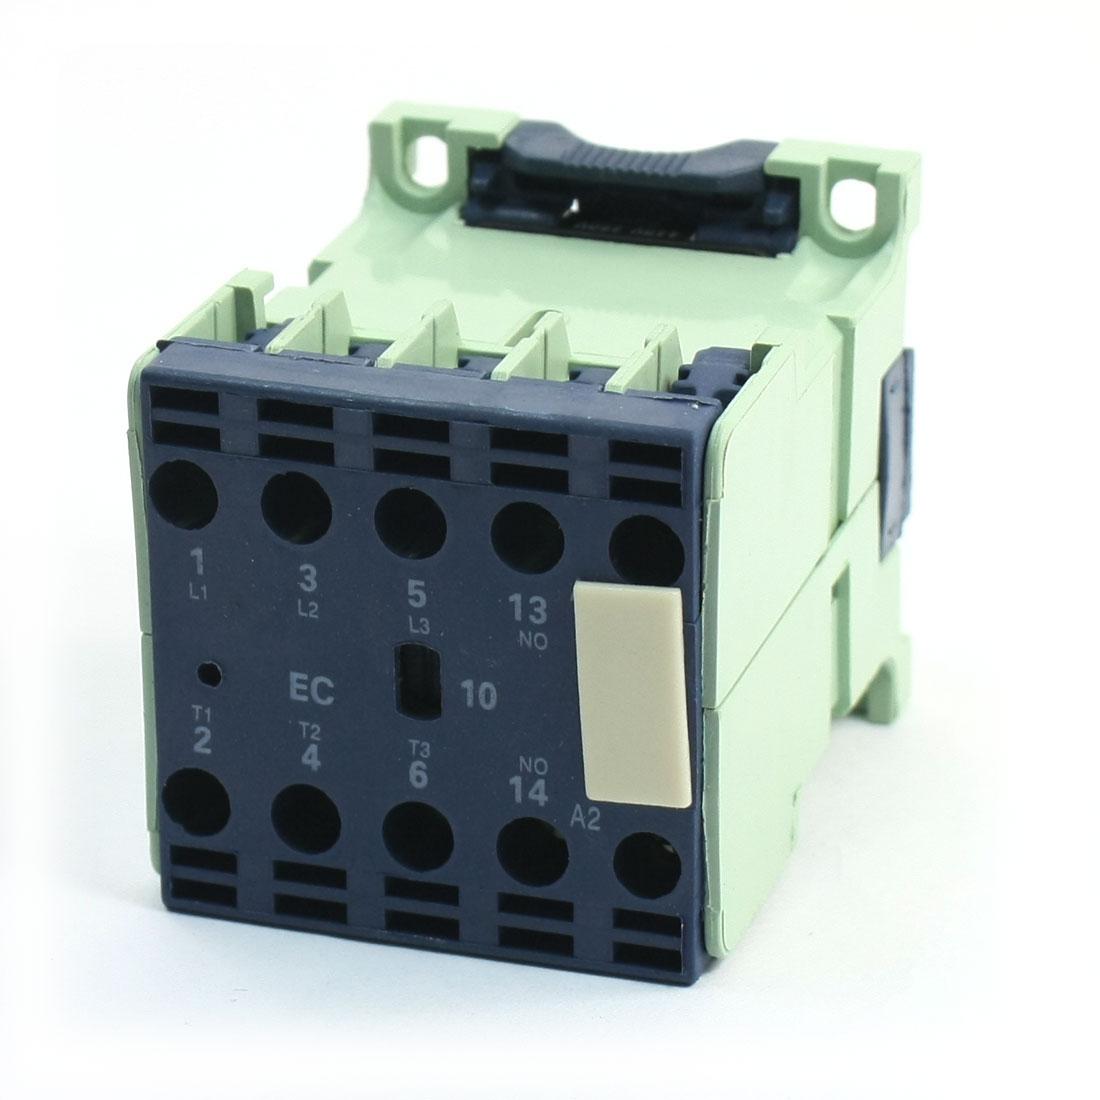 Motor Control AC Contactor 12A 3 Pole 1NO 380-415/440-480V Coil CJX2-1210E